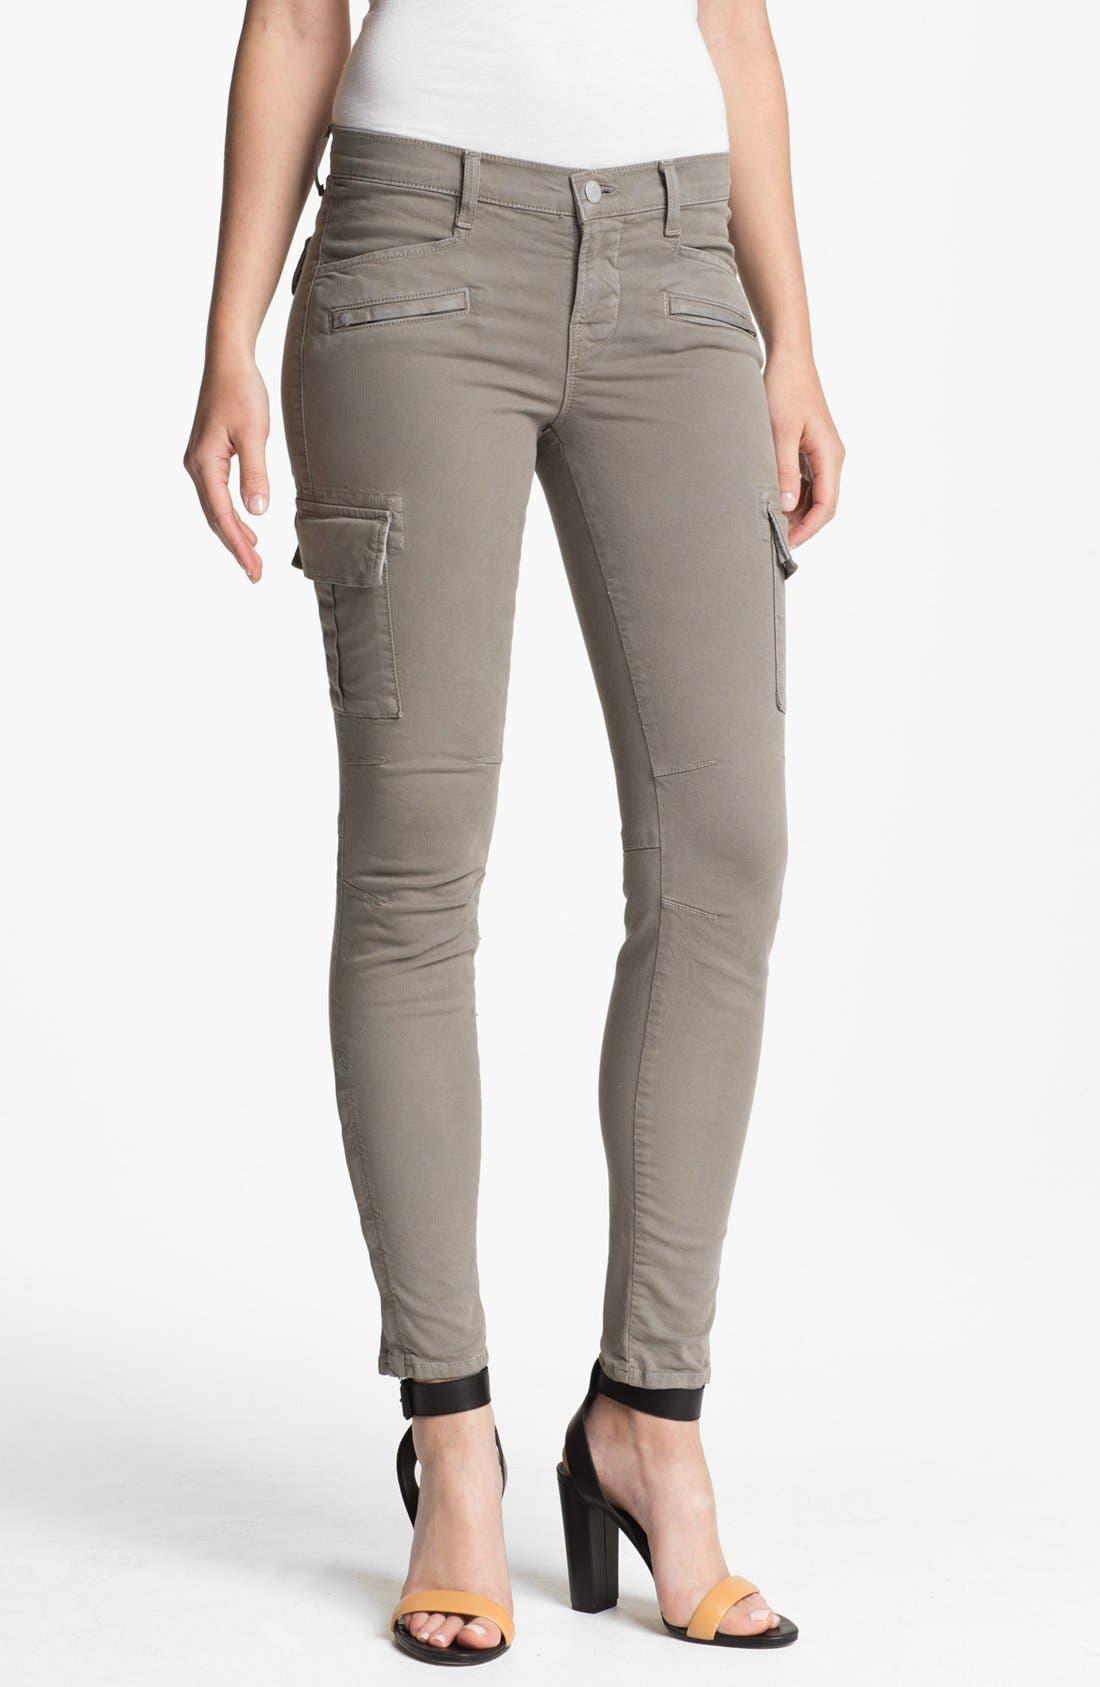 Alternate Image 1 Selected - J Brand 'Grayson' Skinny Cargo Pants